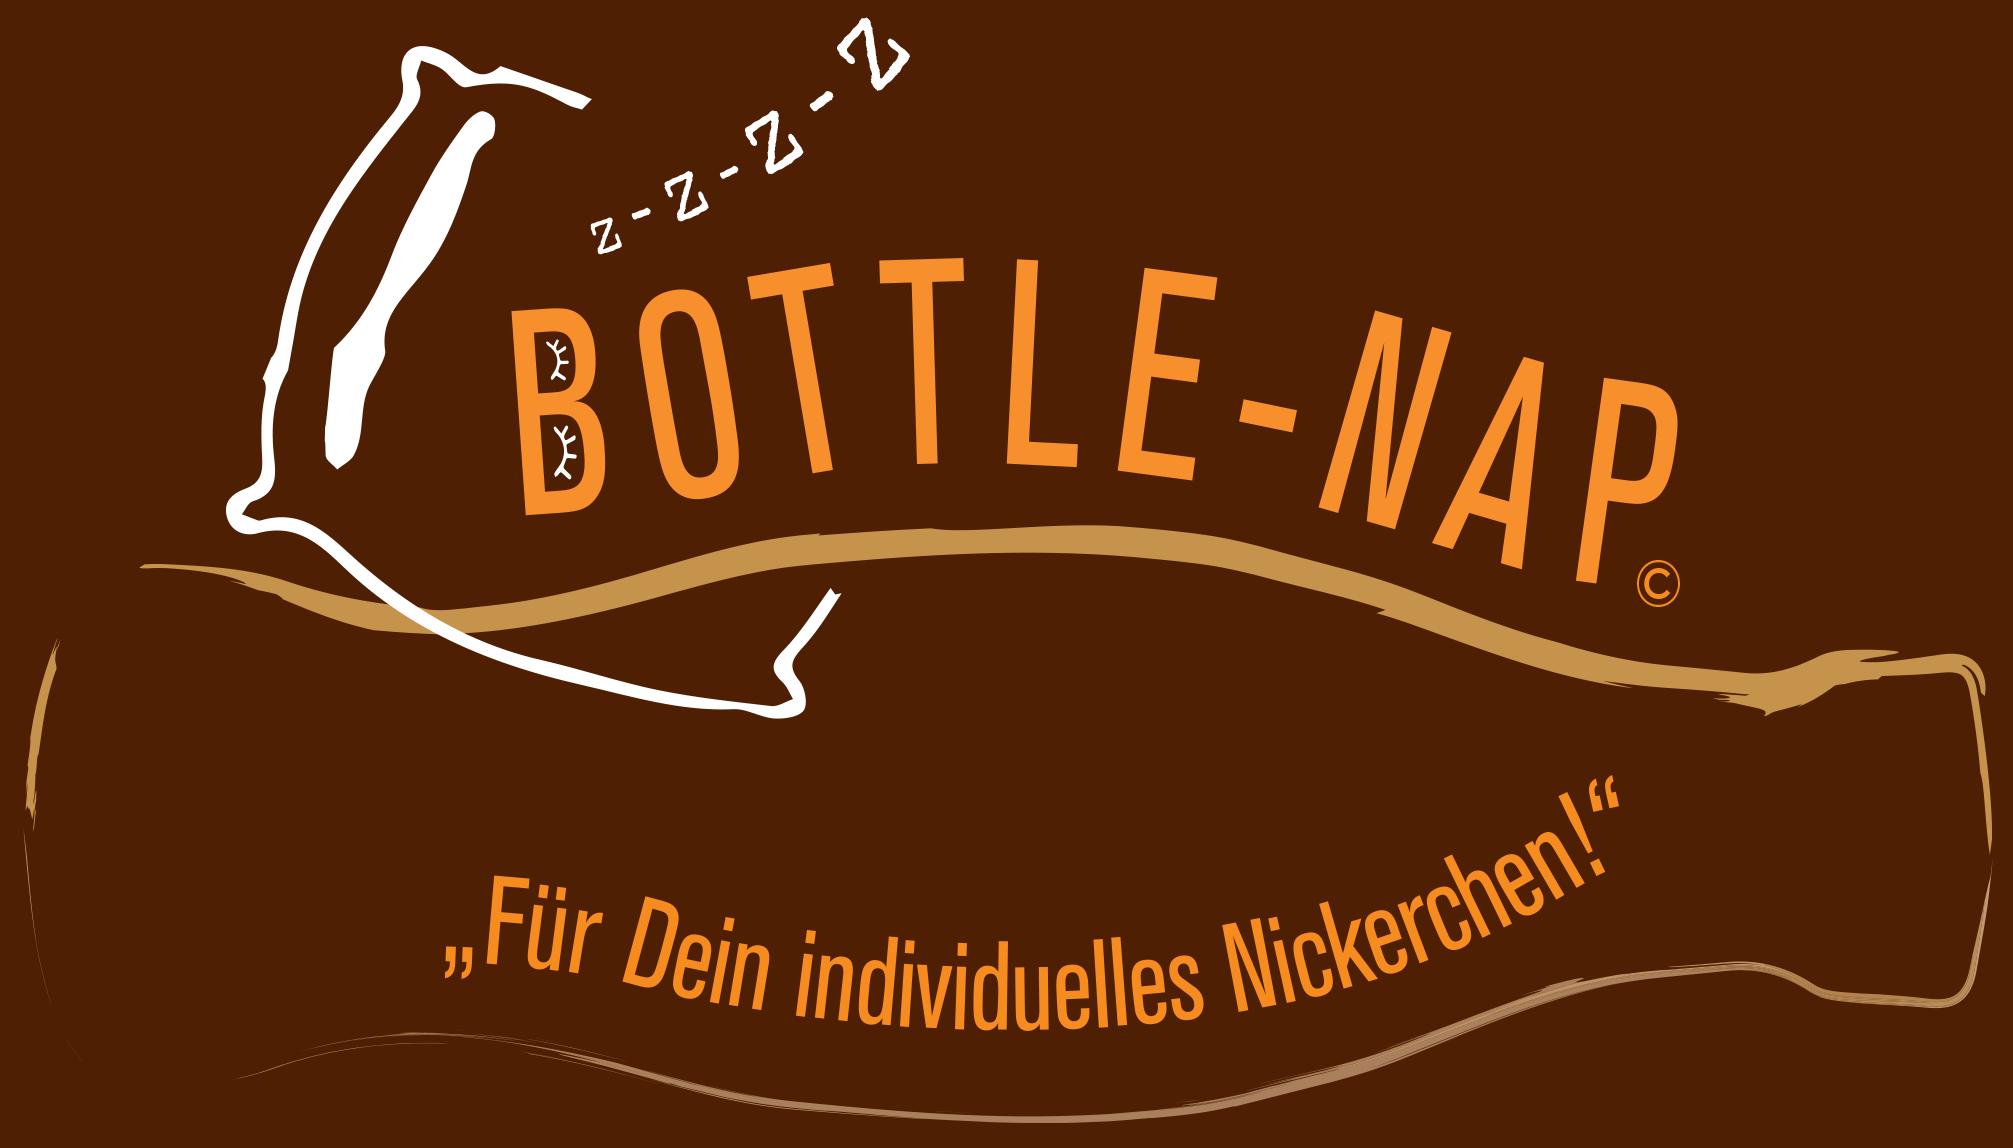 Bottle Nap